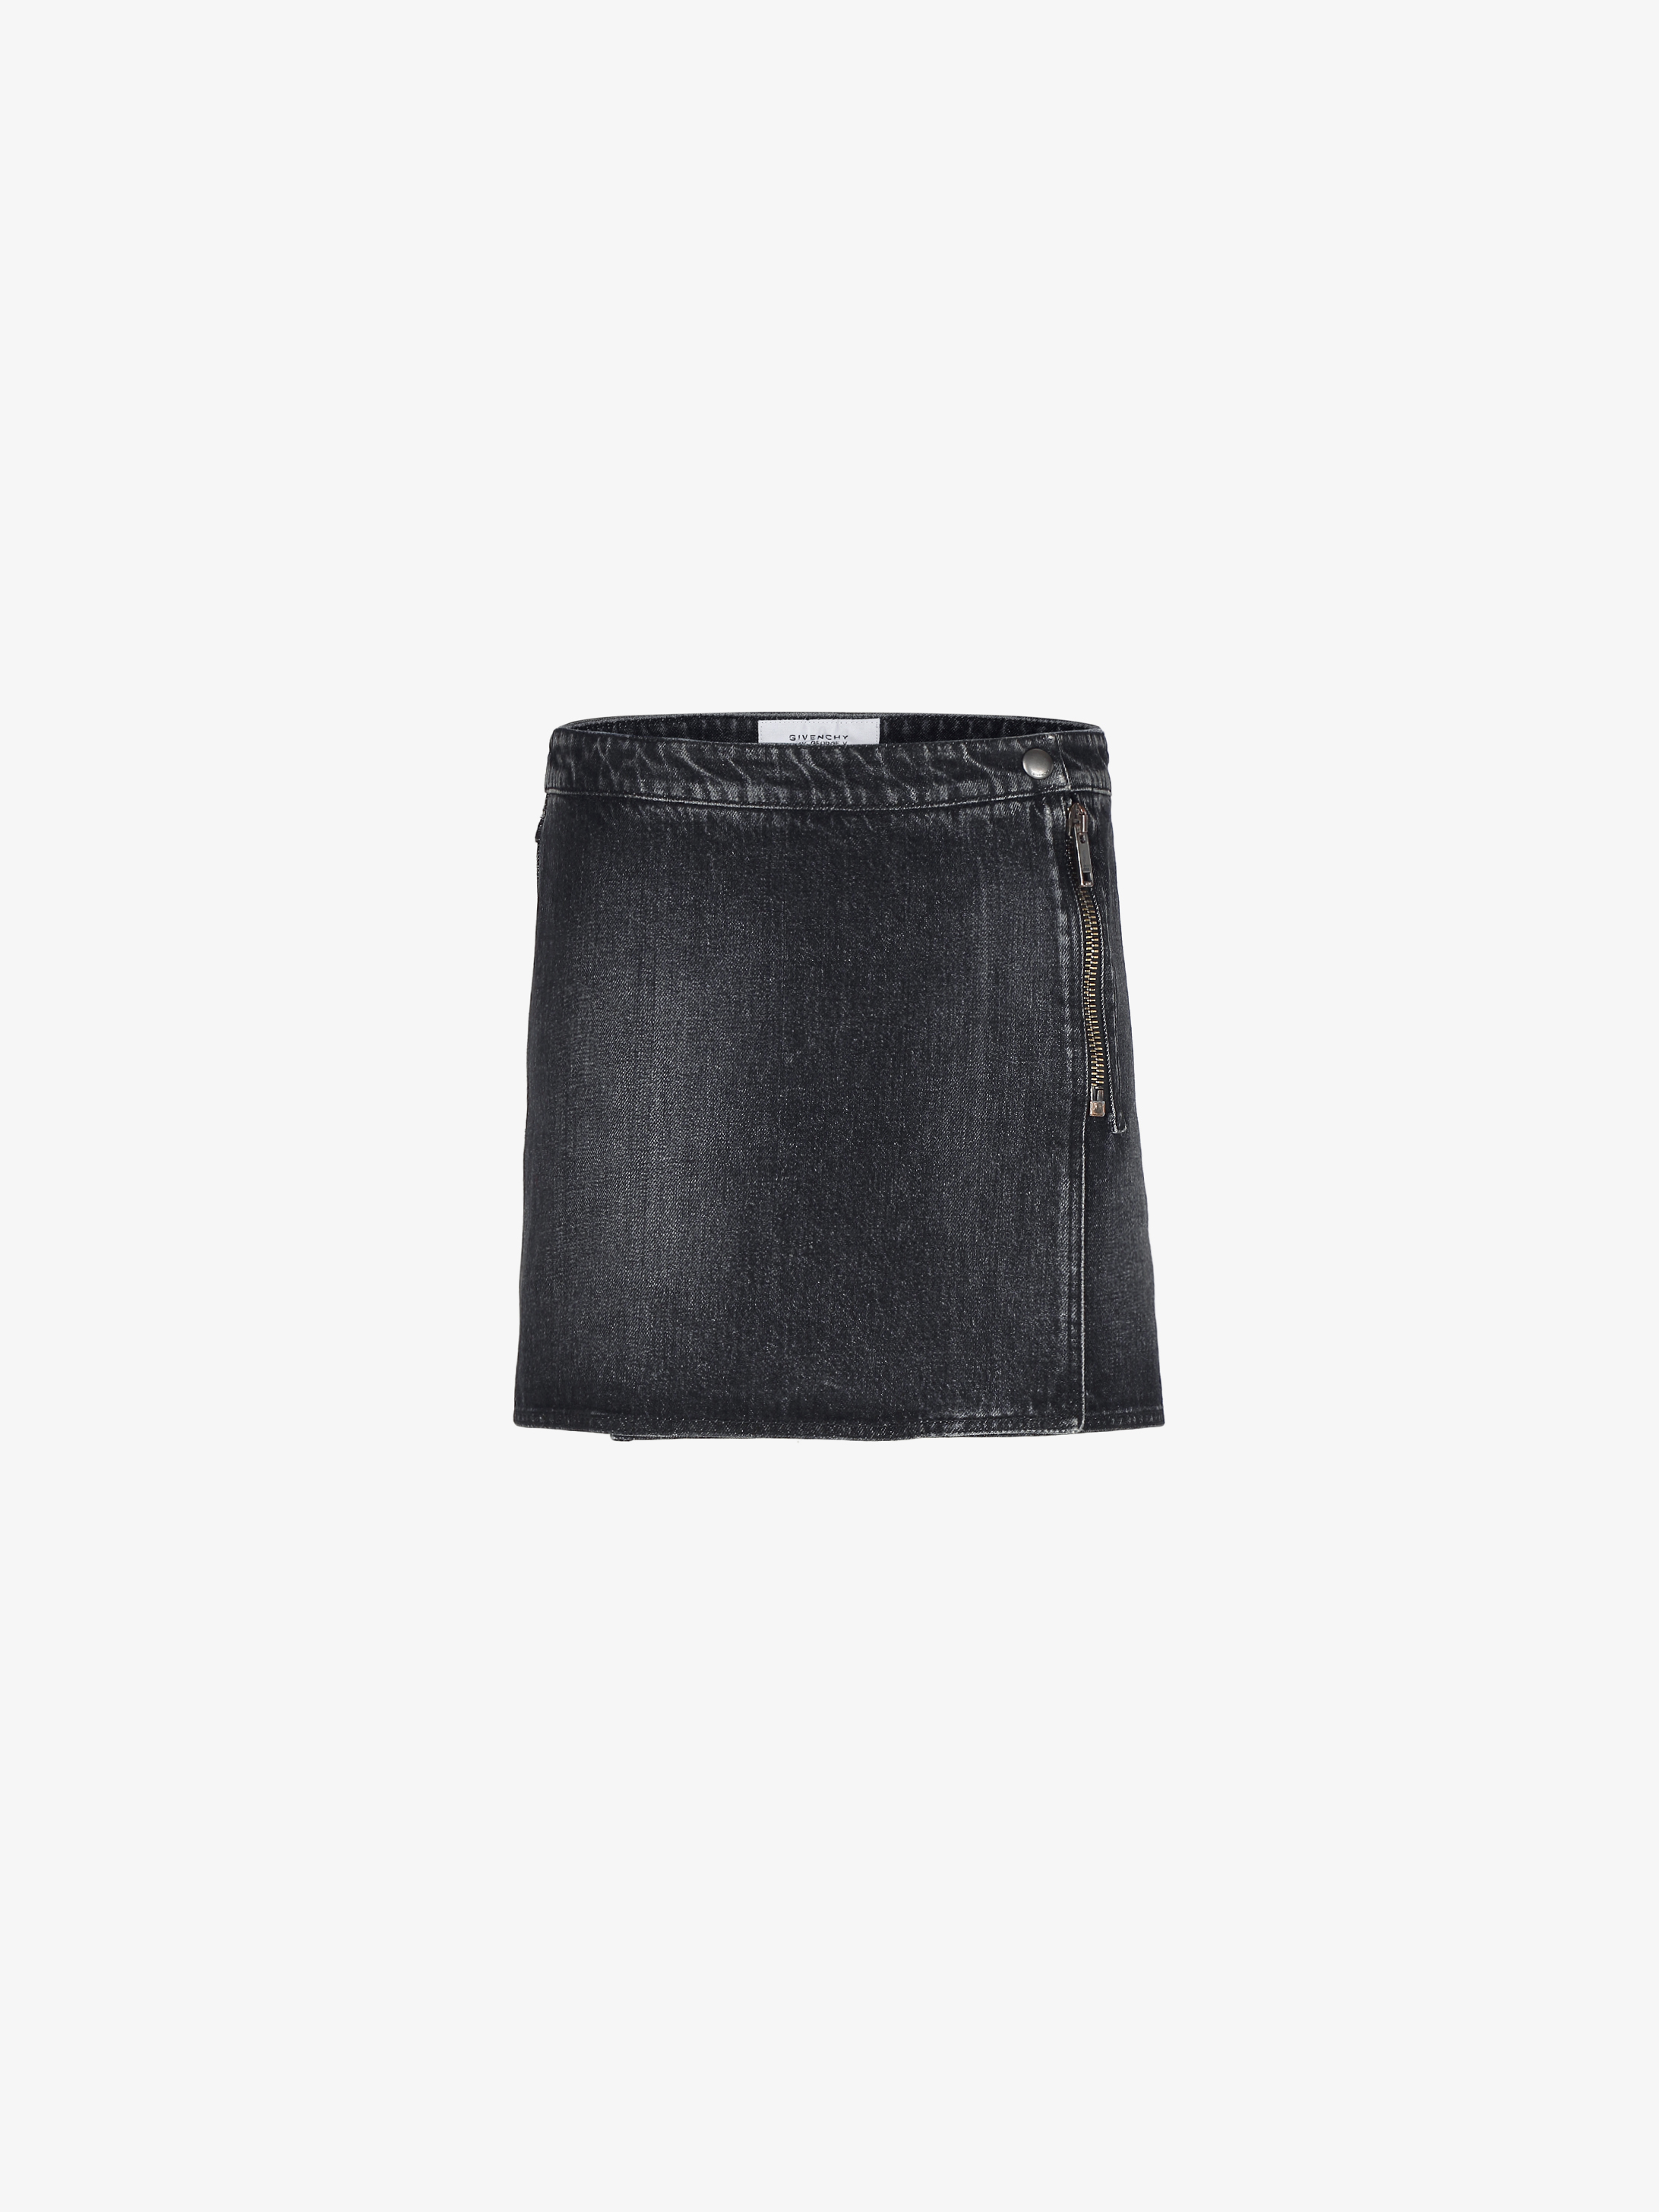 Wrap mini skirt in vintage denim